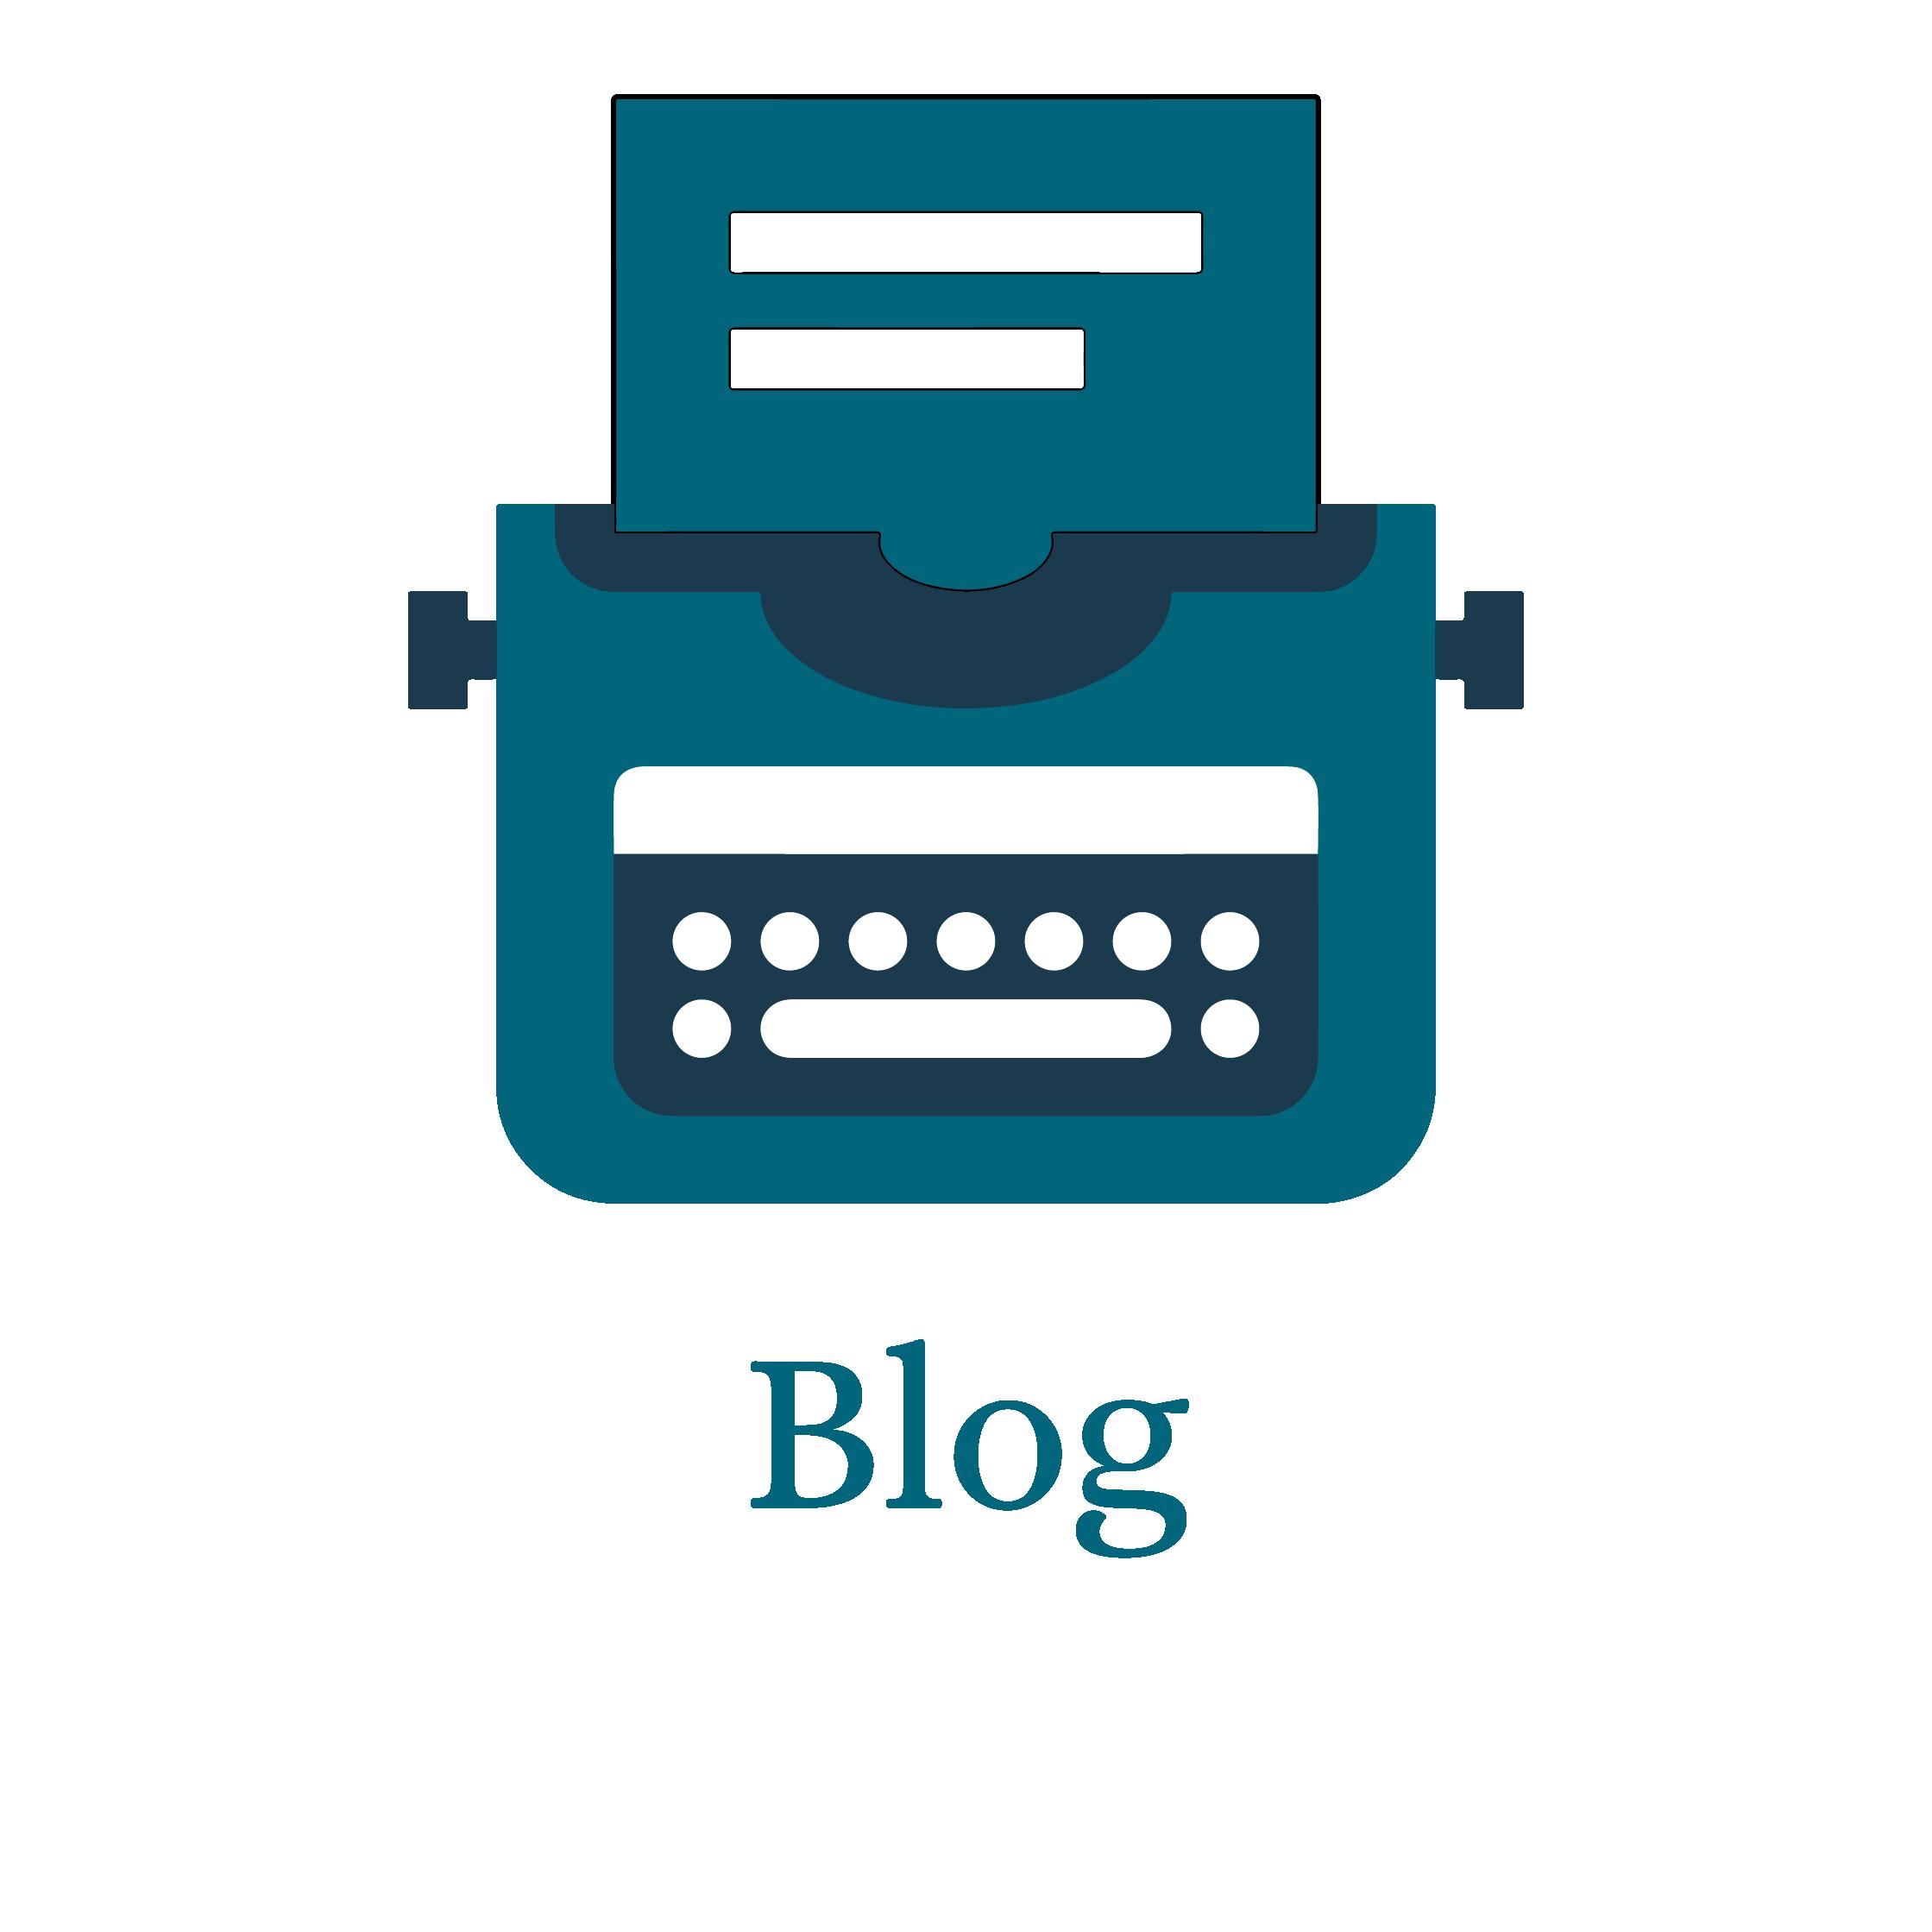 mc blog-01.png